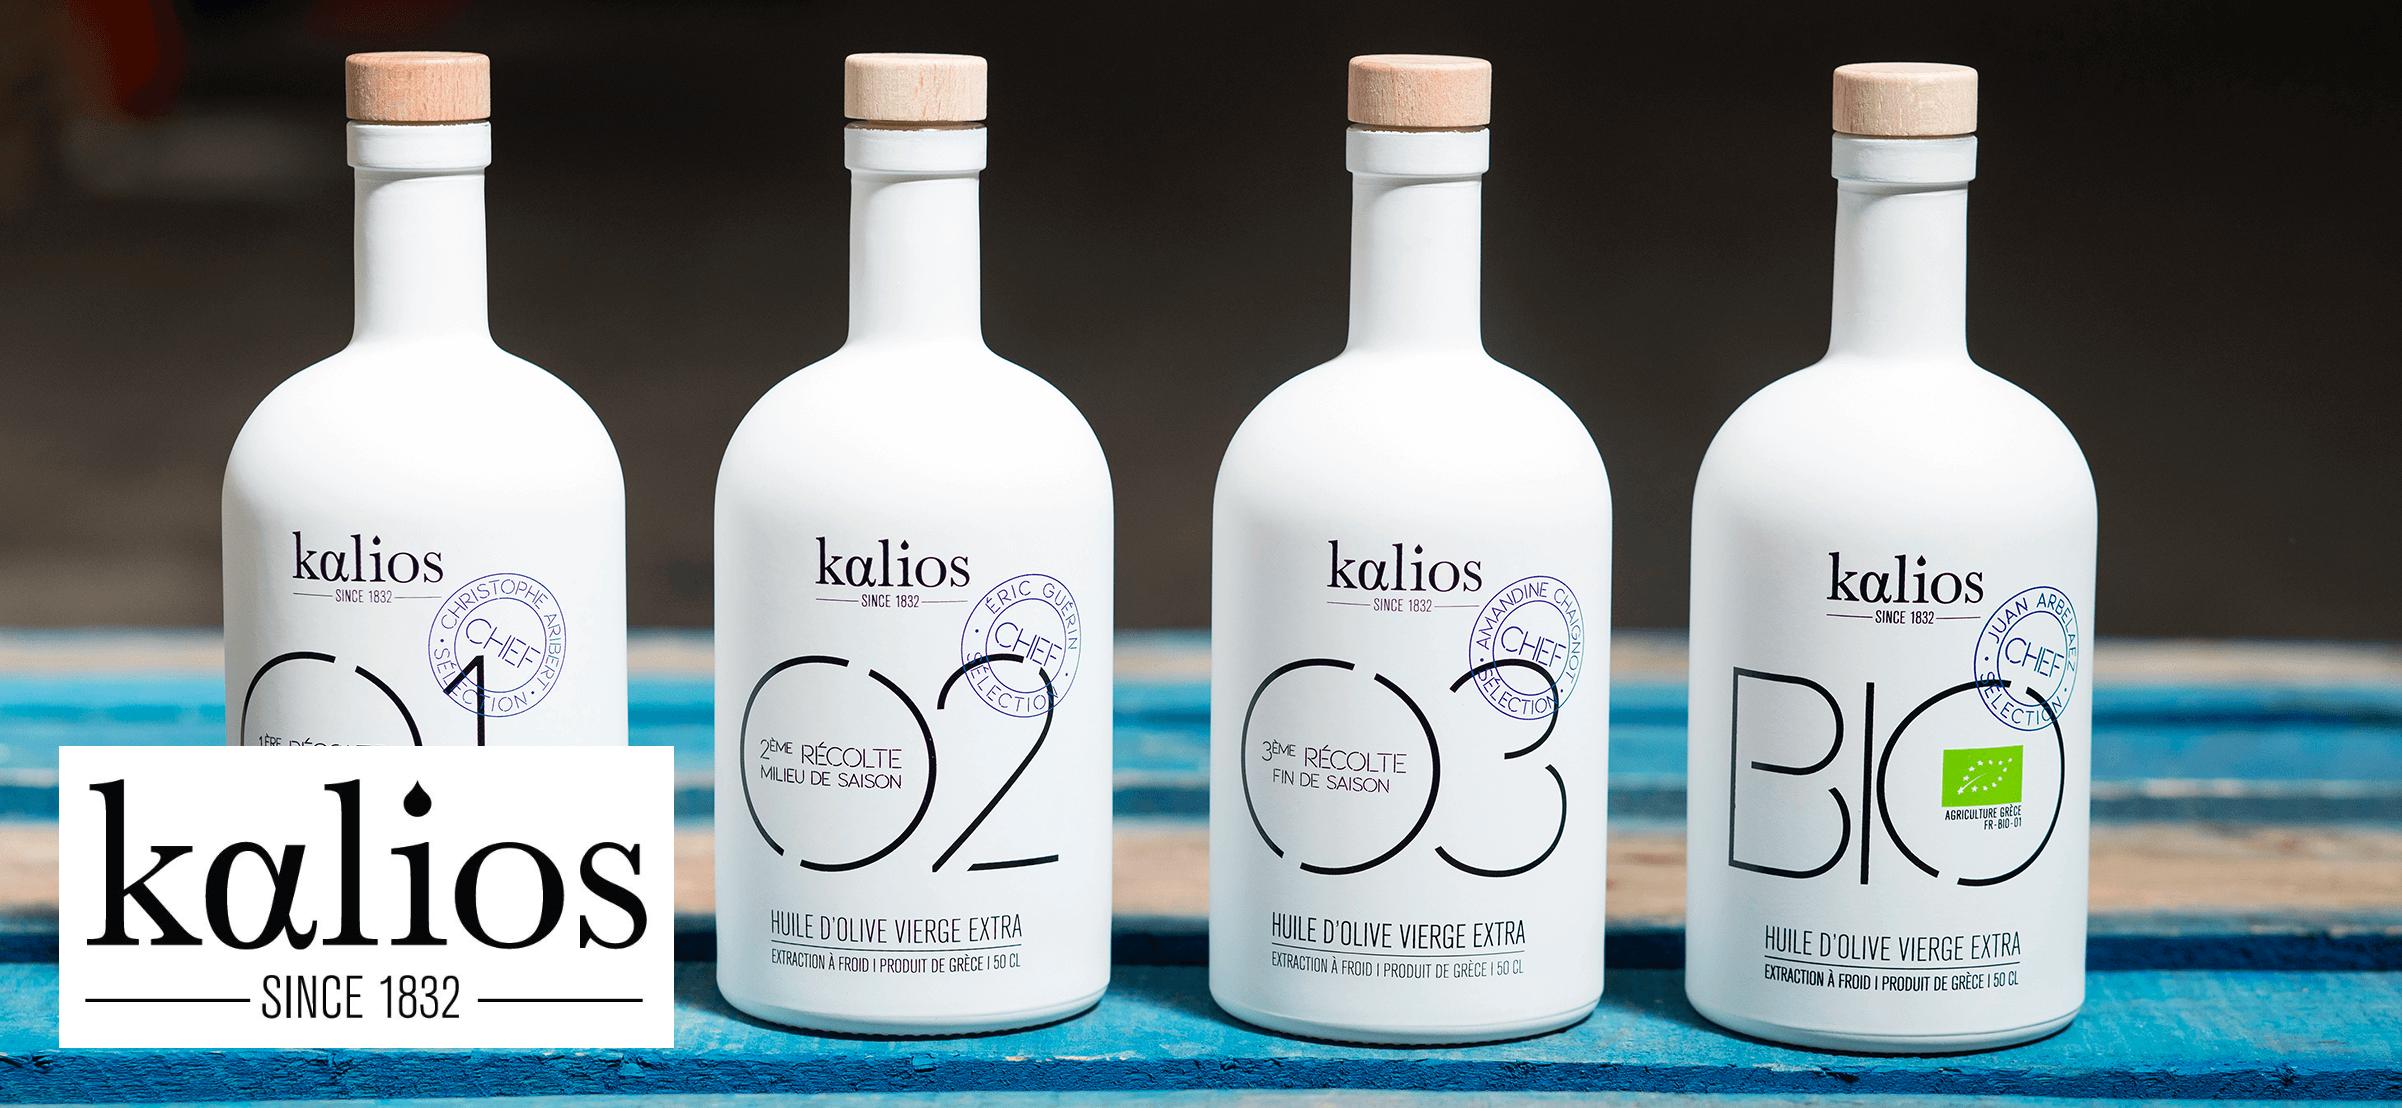 kalios-huile-dolive-des-chefs